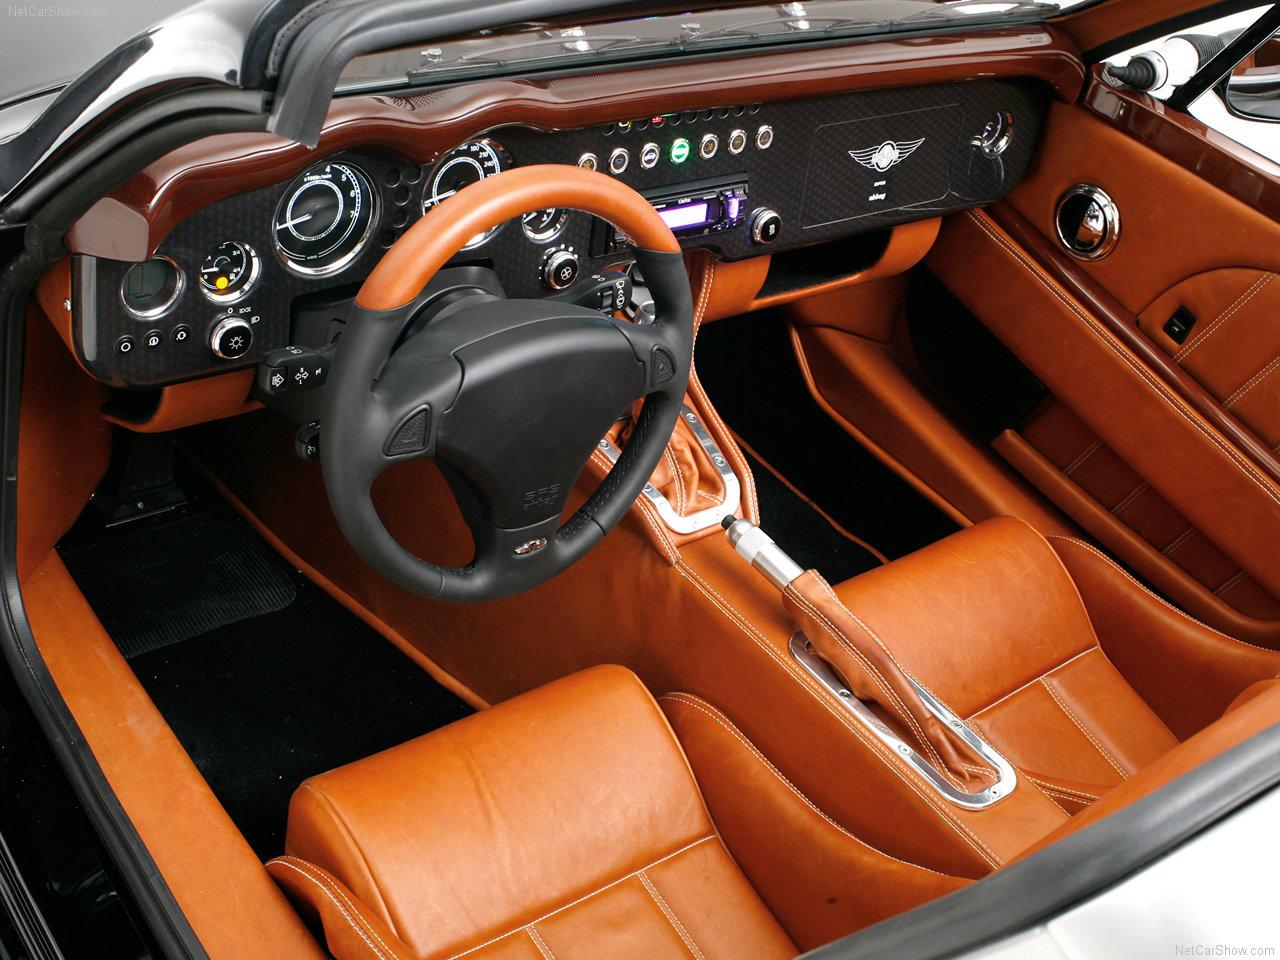 Marque voiture anglaise logo voiture Morgan2 - Marque voiture anglaise logo voiture Morgan